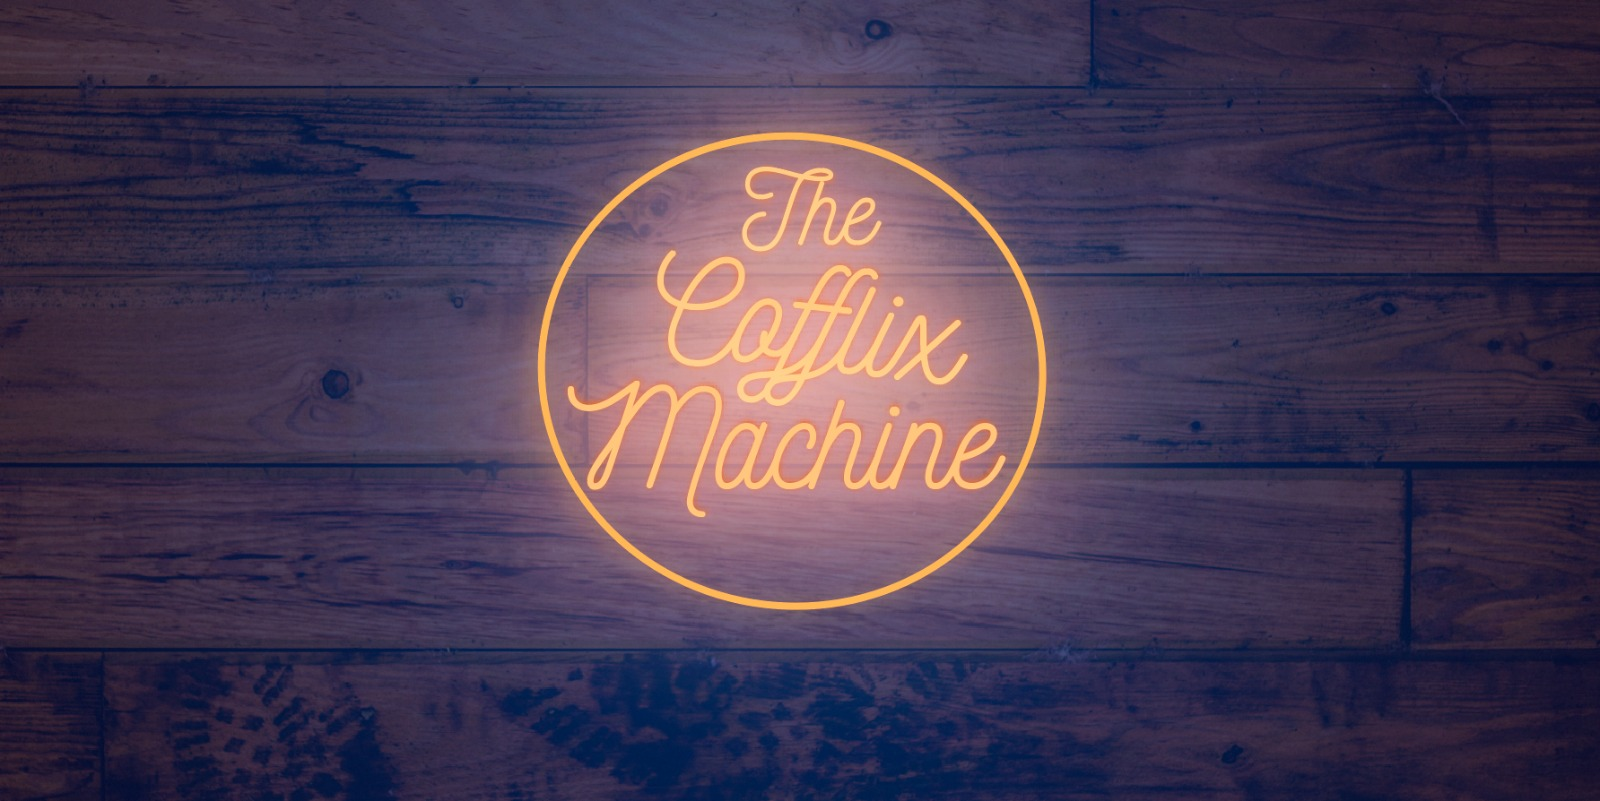 Netflix - The Cofflix Machine - logo2.jpeg